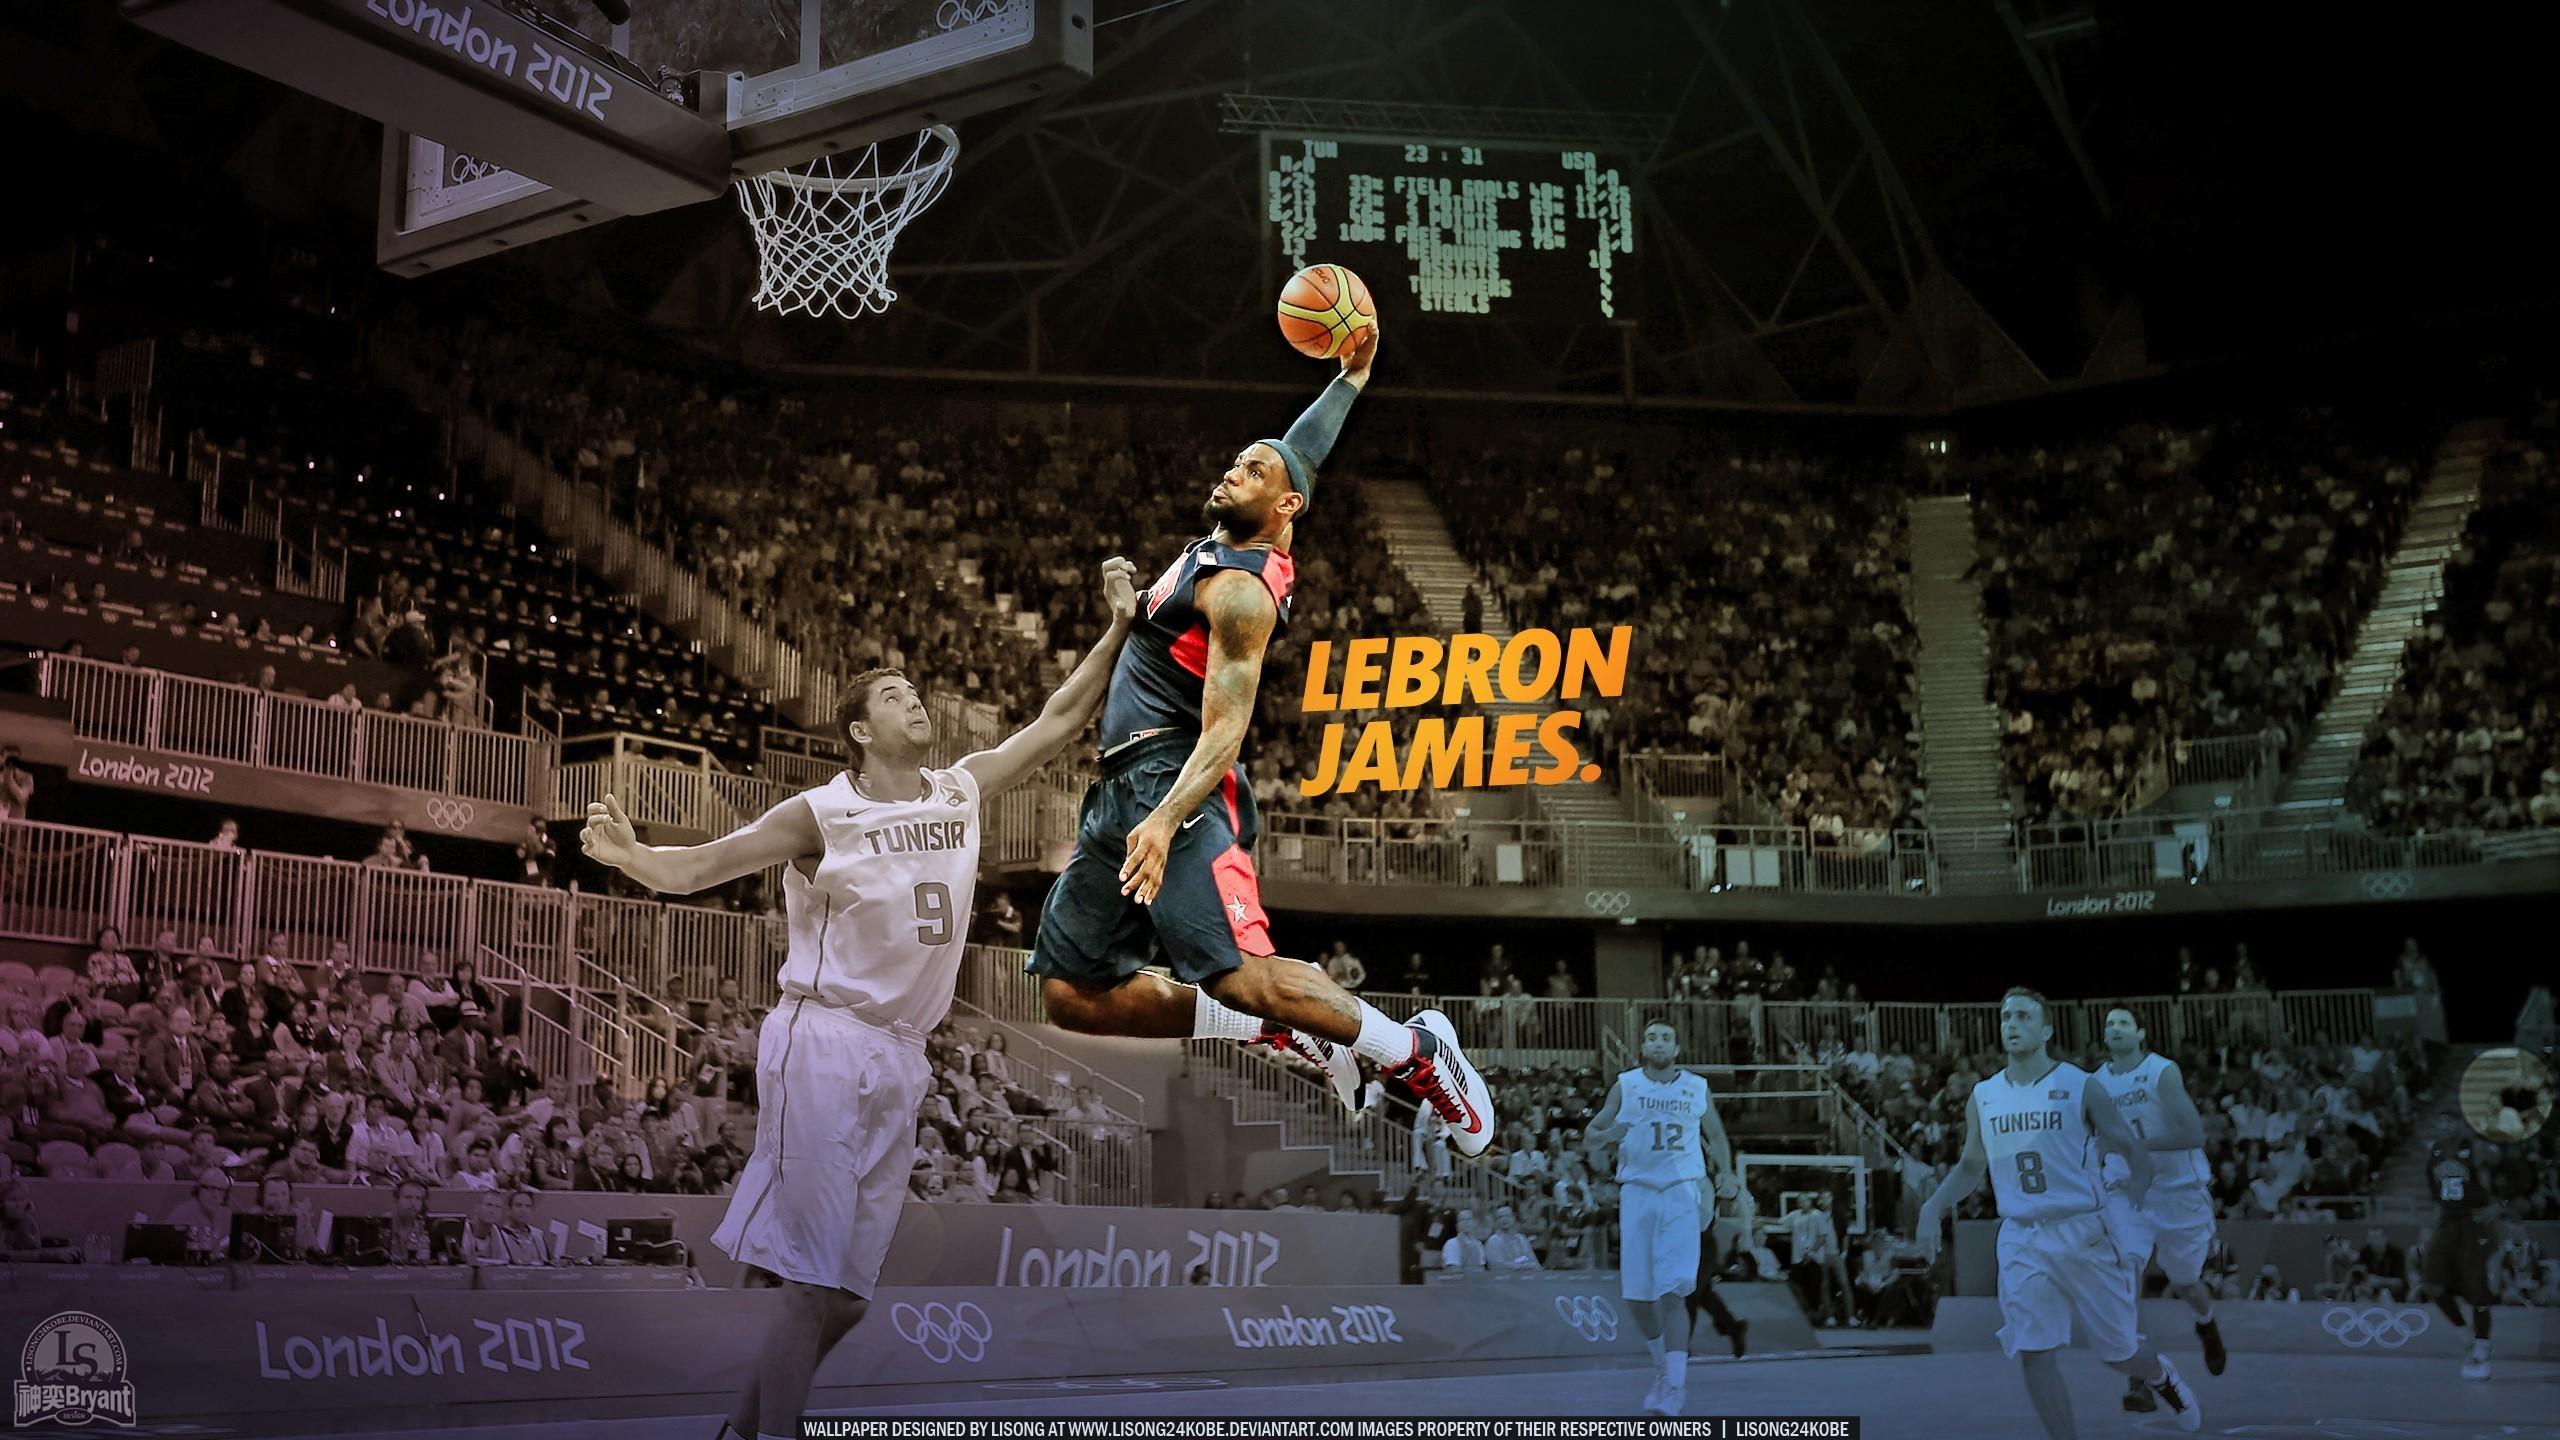 Lebron James Dunk Wallpaper 71 Pictures